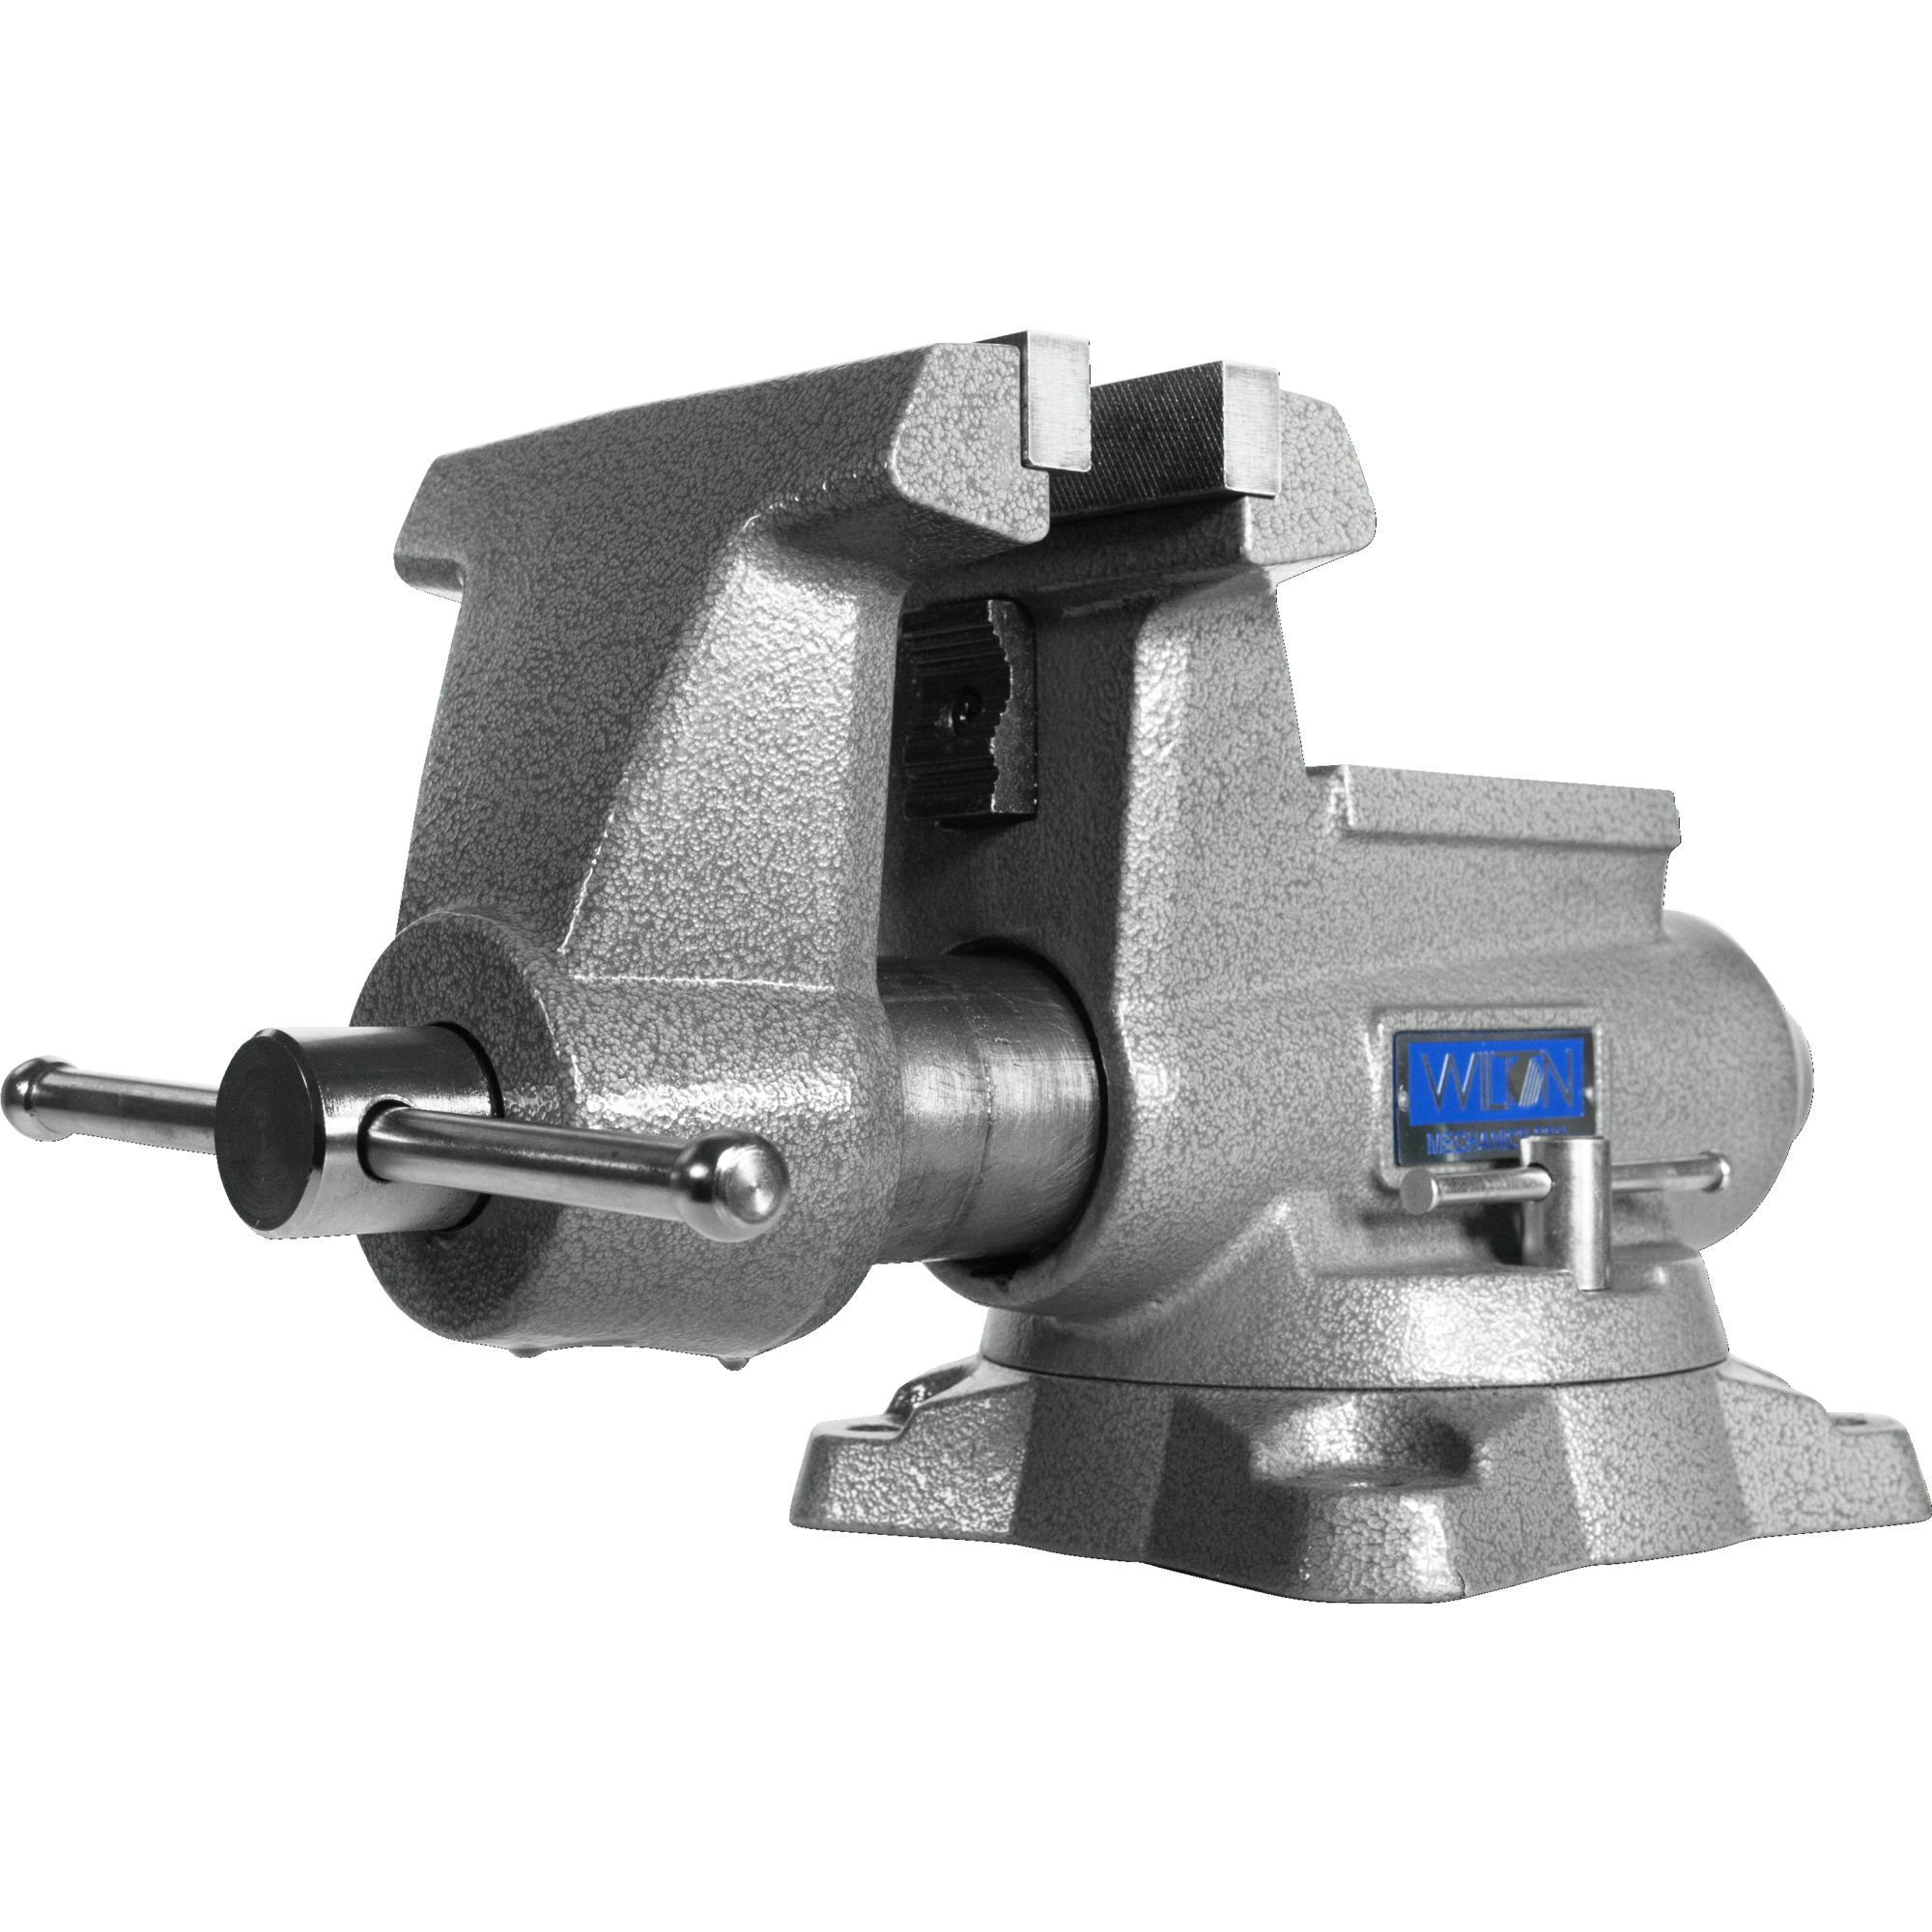 Wilton Tools 28812 865M Wilton Mechanics Pro Vise 6.5''